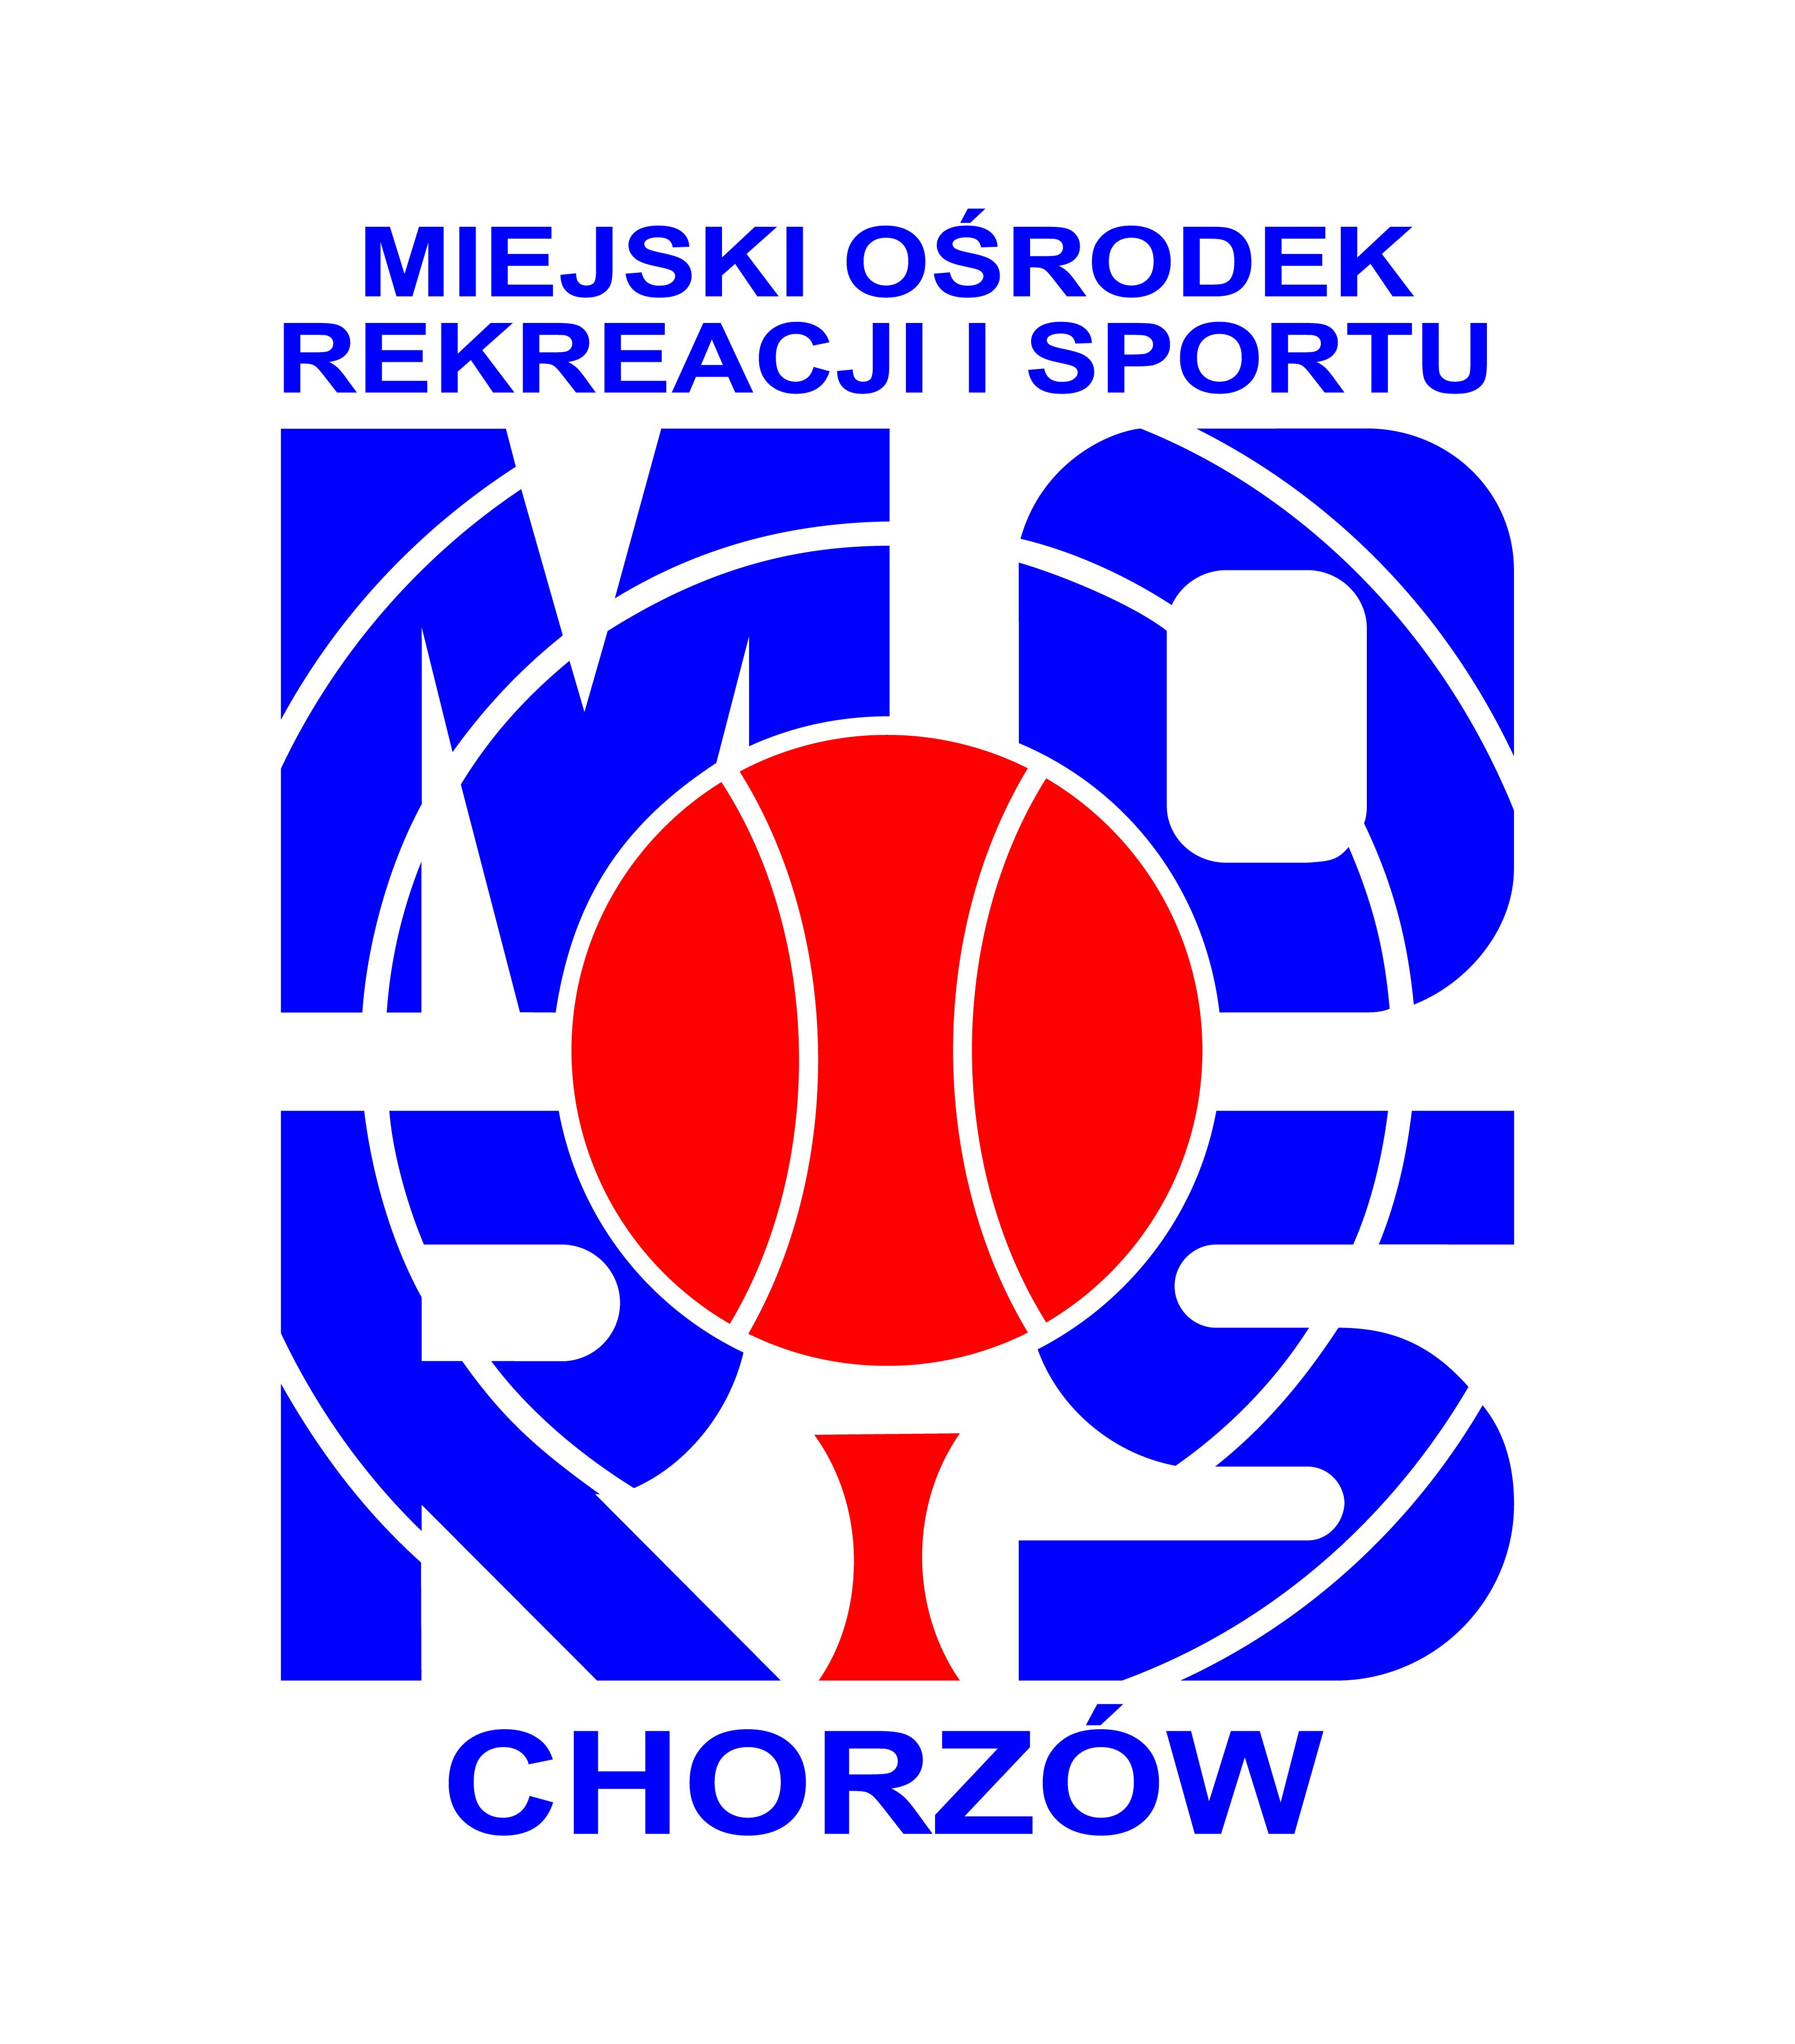 moris_chorzow_logo-01